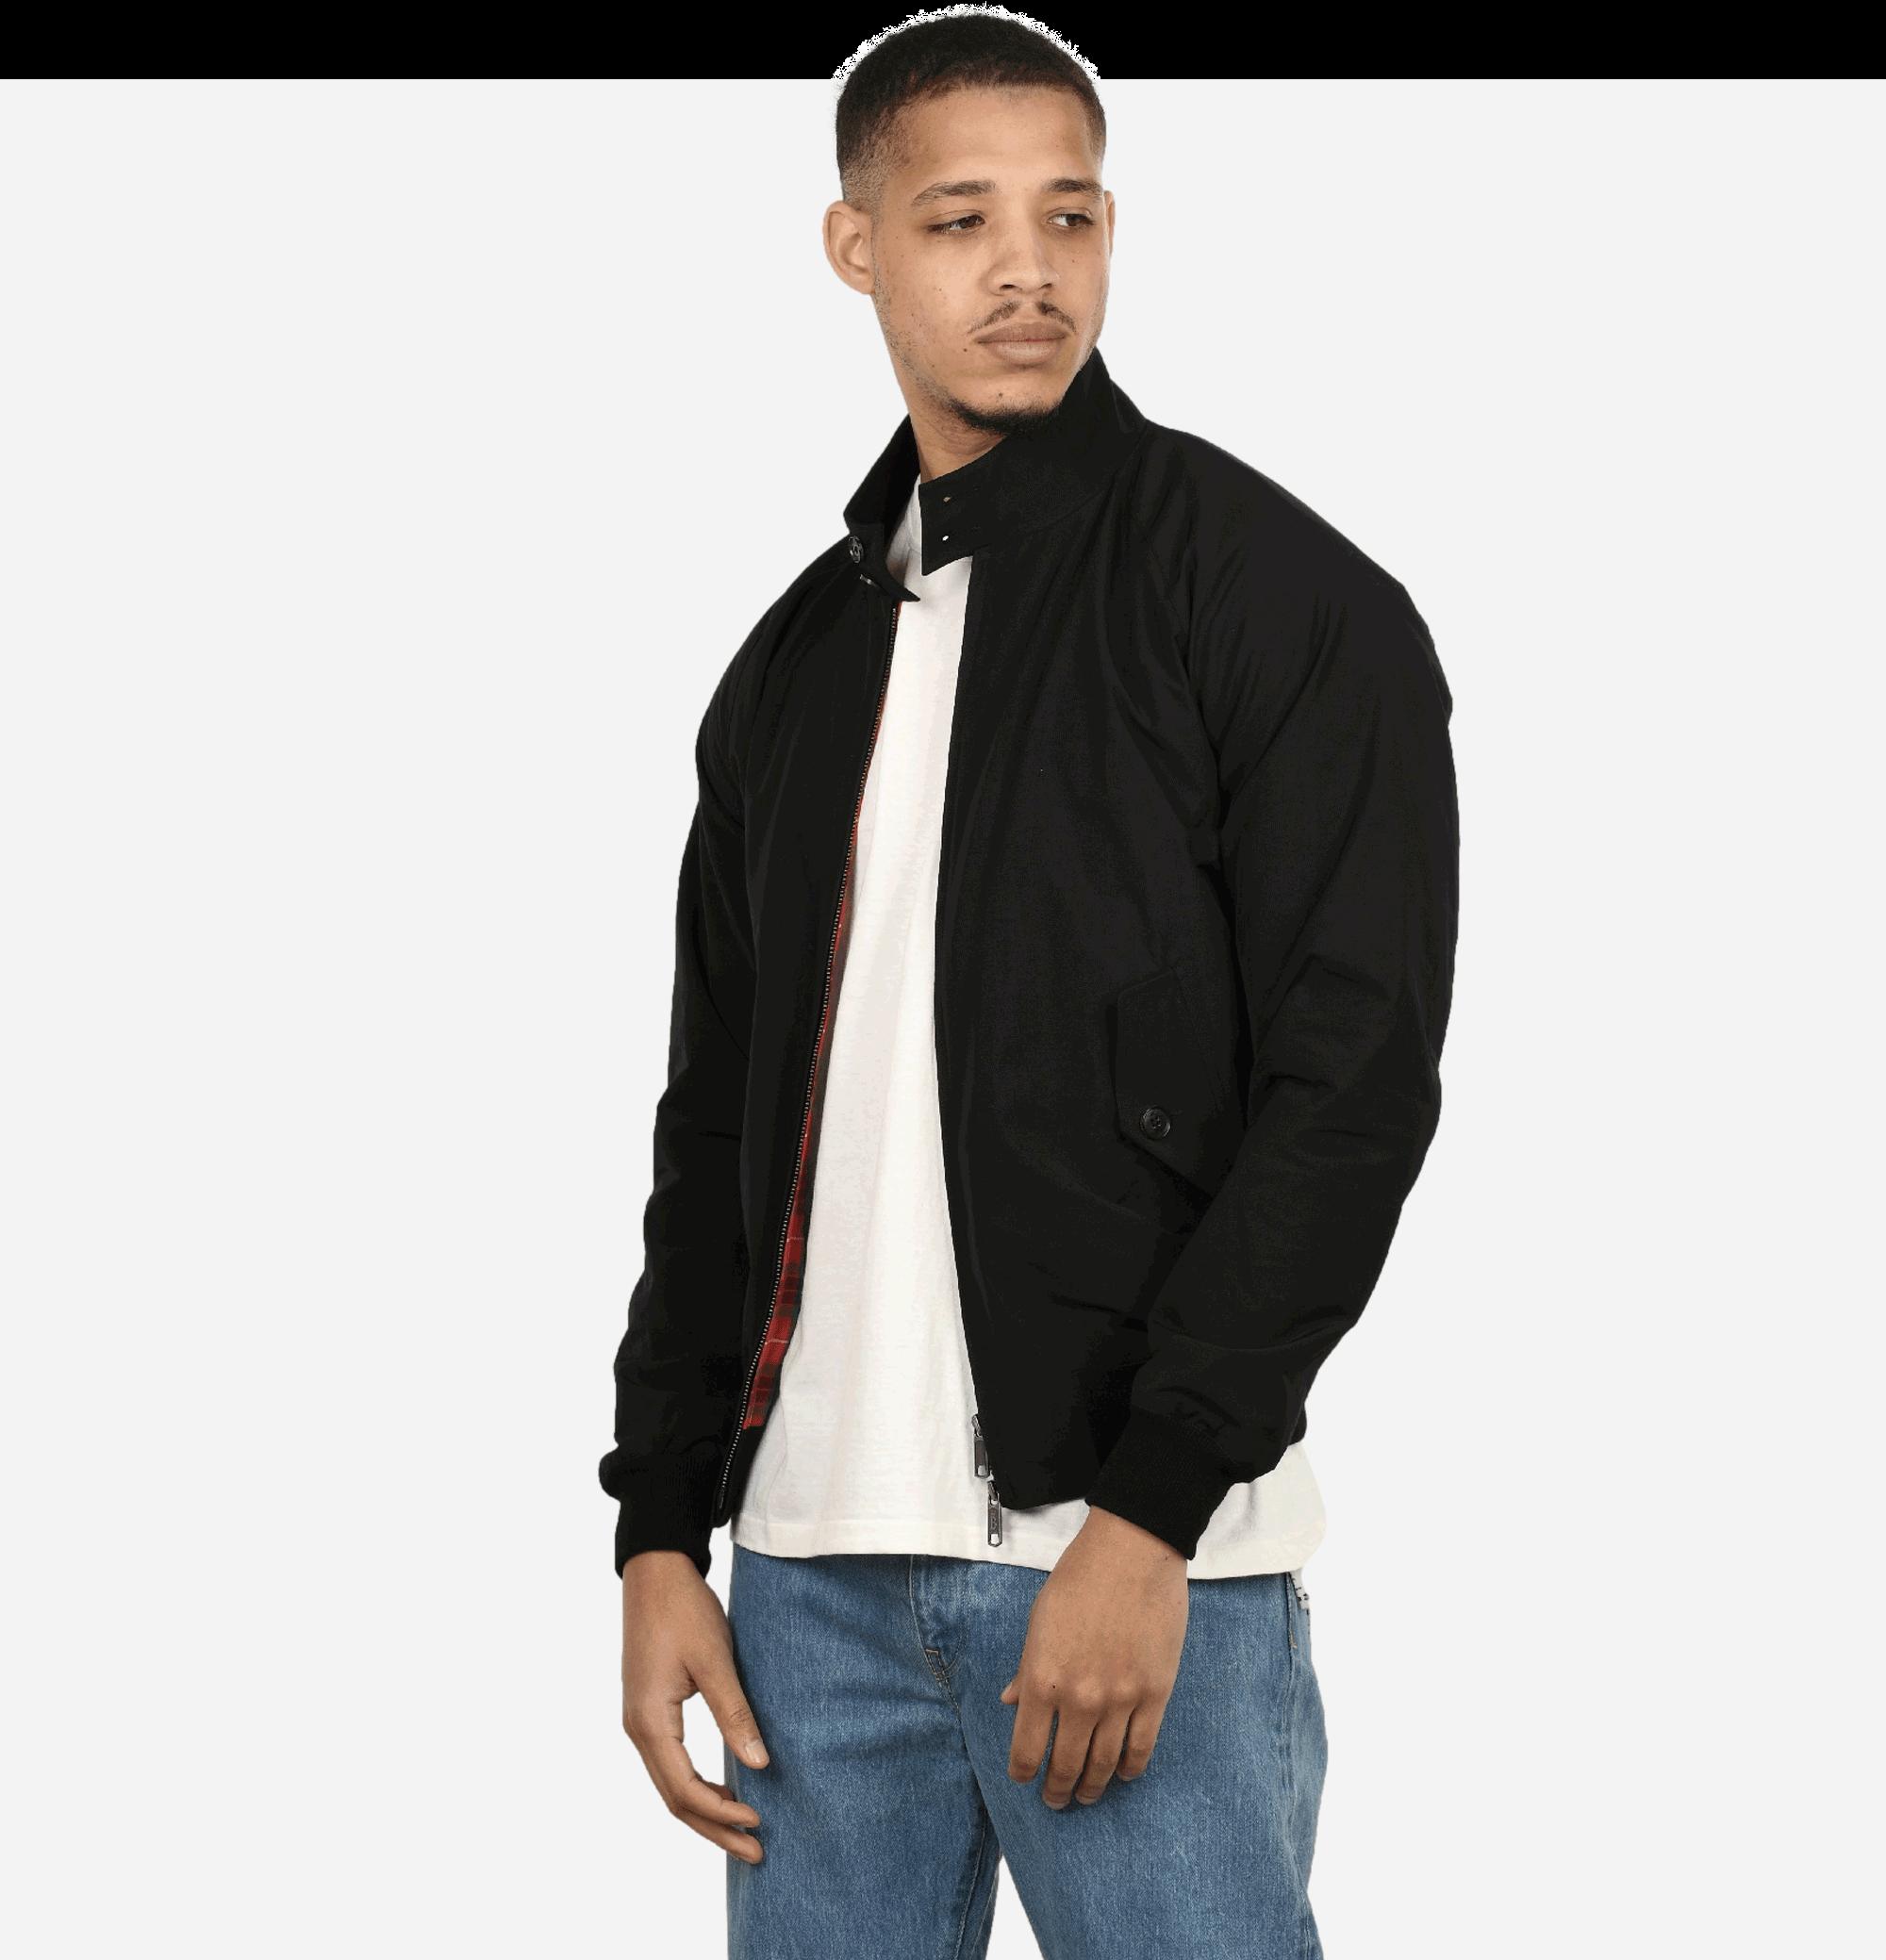 G9 Harrington Jacket Black